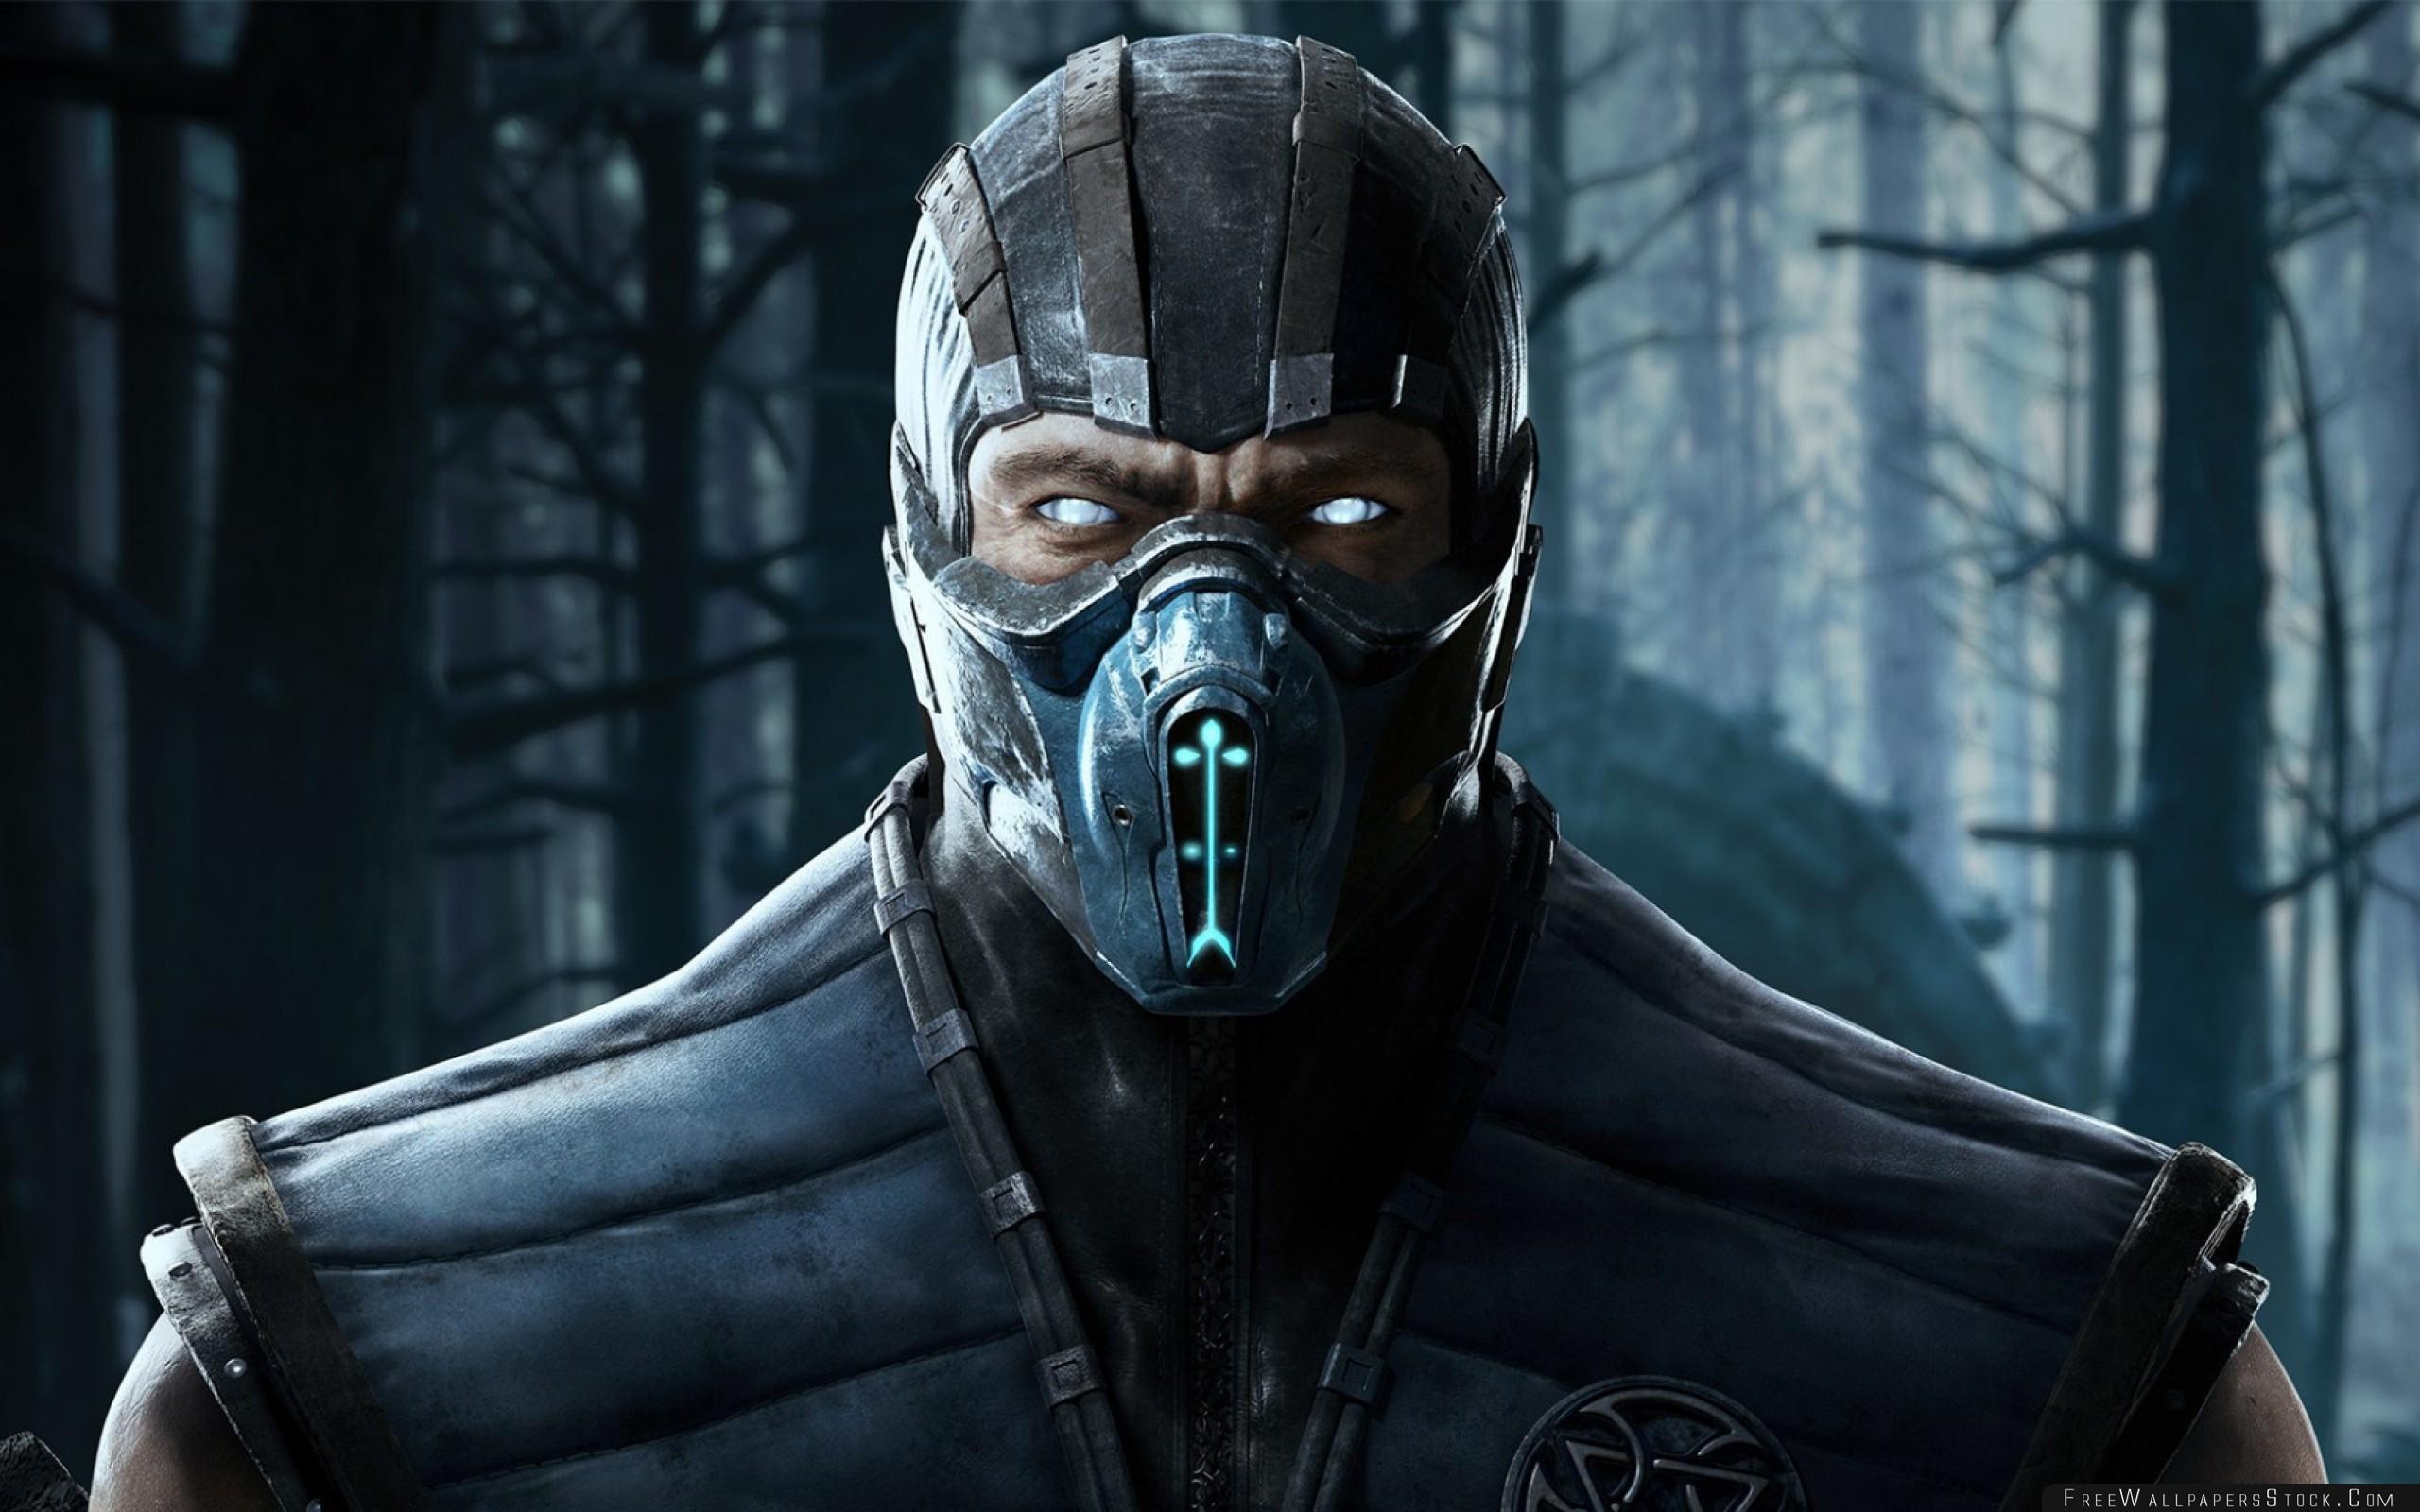 Download Free Wallpaper Mortal Kombat   Sub Zero Kriomant Ninja